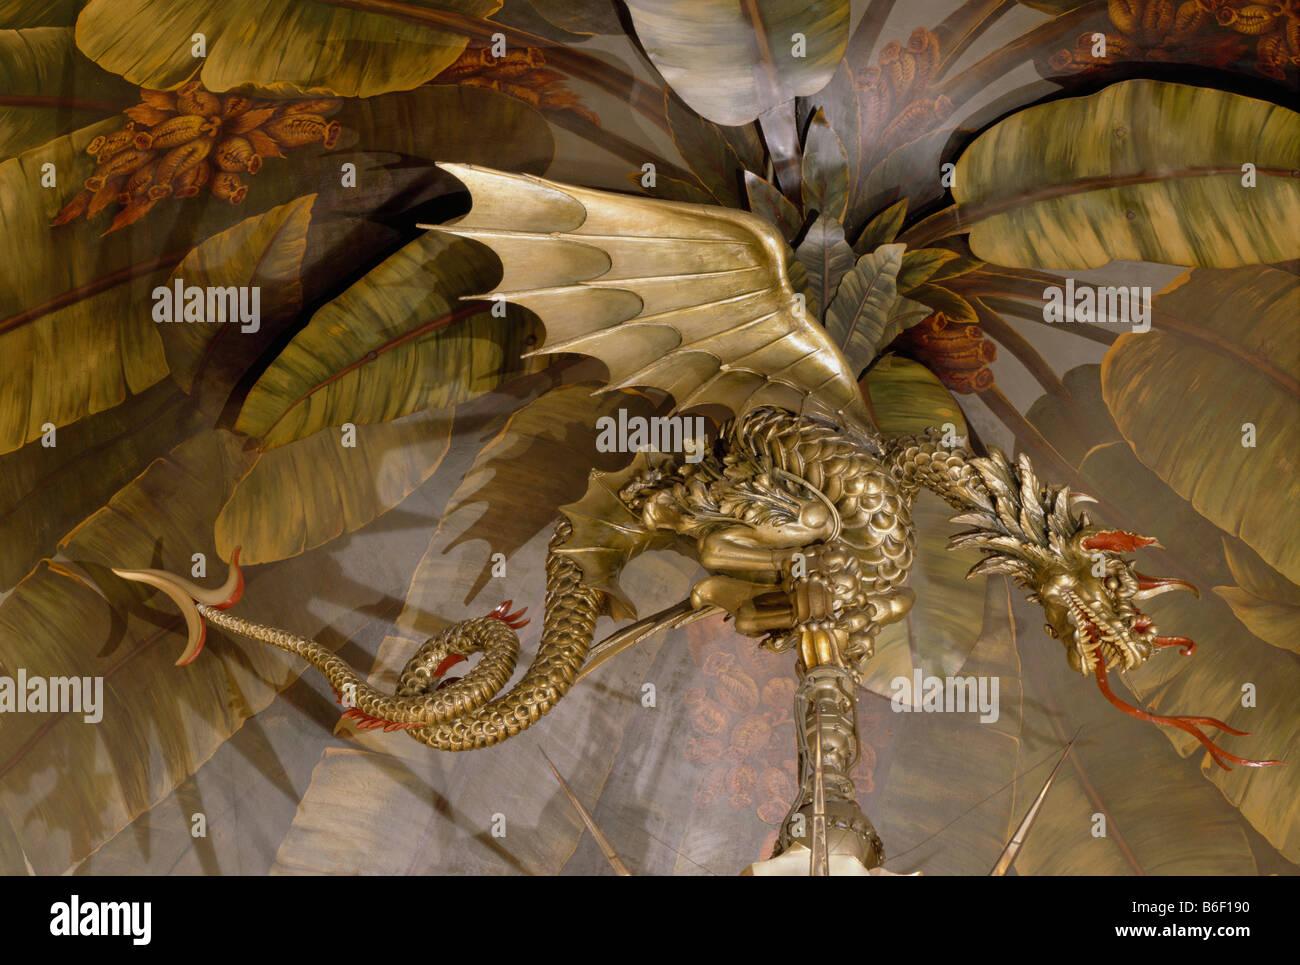 Royal Pavilion Brighton. Dragon on Banqueting Room gasolier - Stock Image